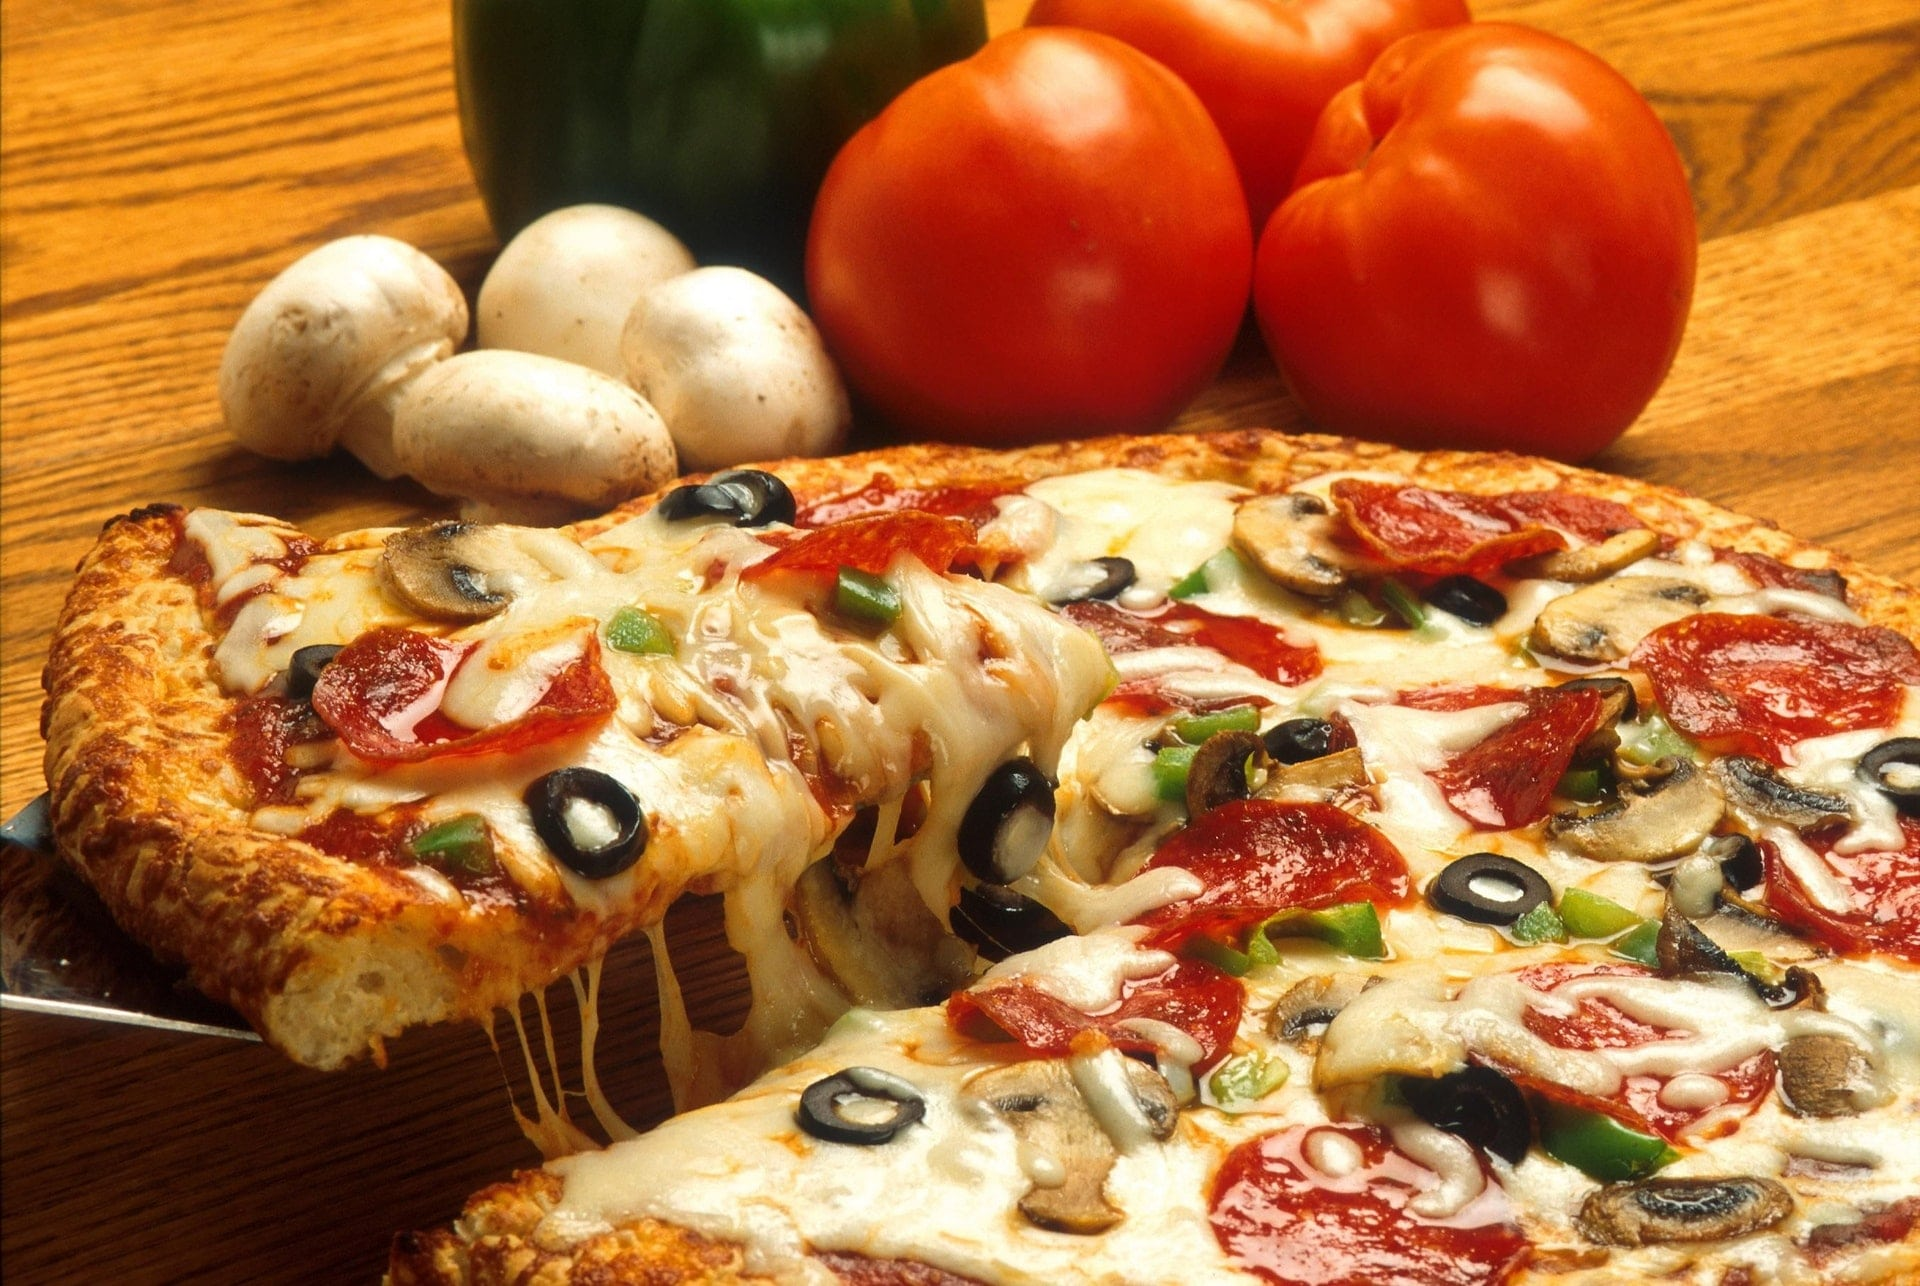 vegetables italian pizza restaurant cheese tomato mushroom black olive food 天然乳酪、加工起司的正確保存方法,讓起司的新鮮風味不流失